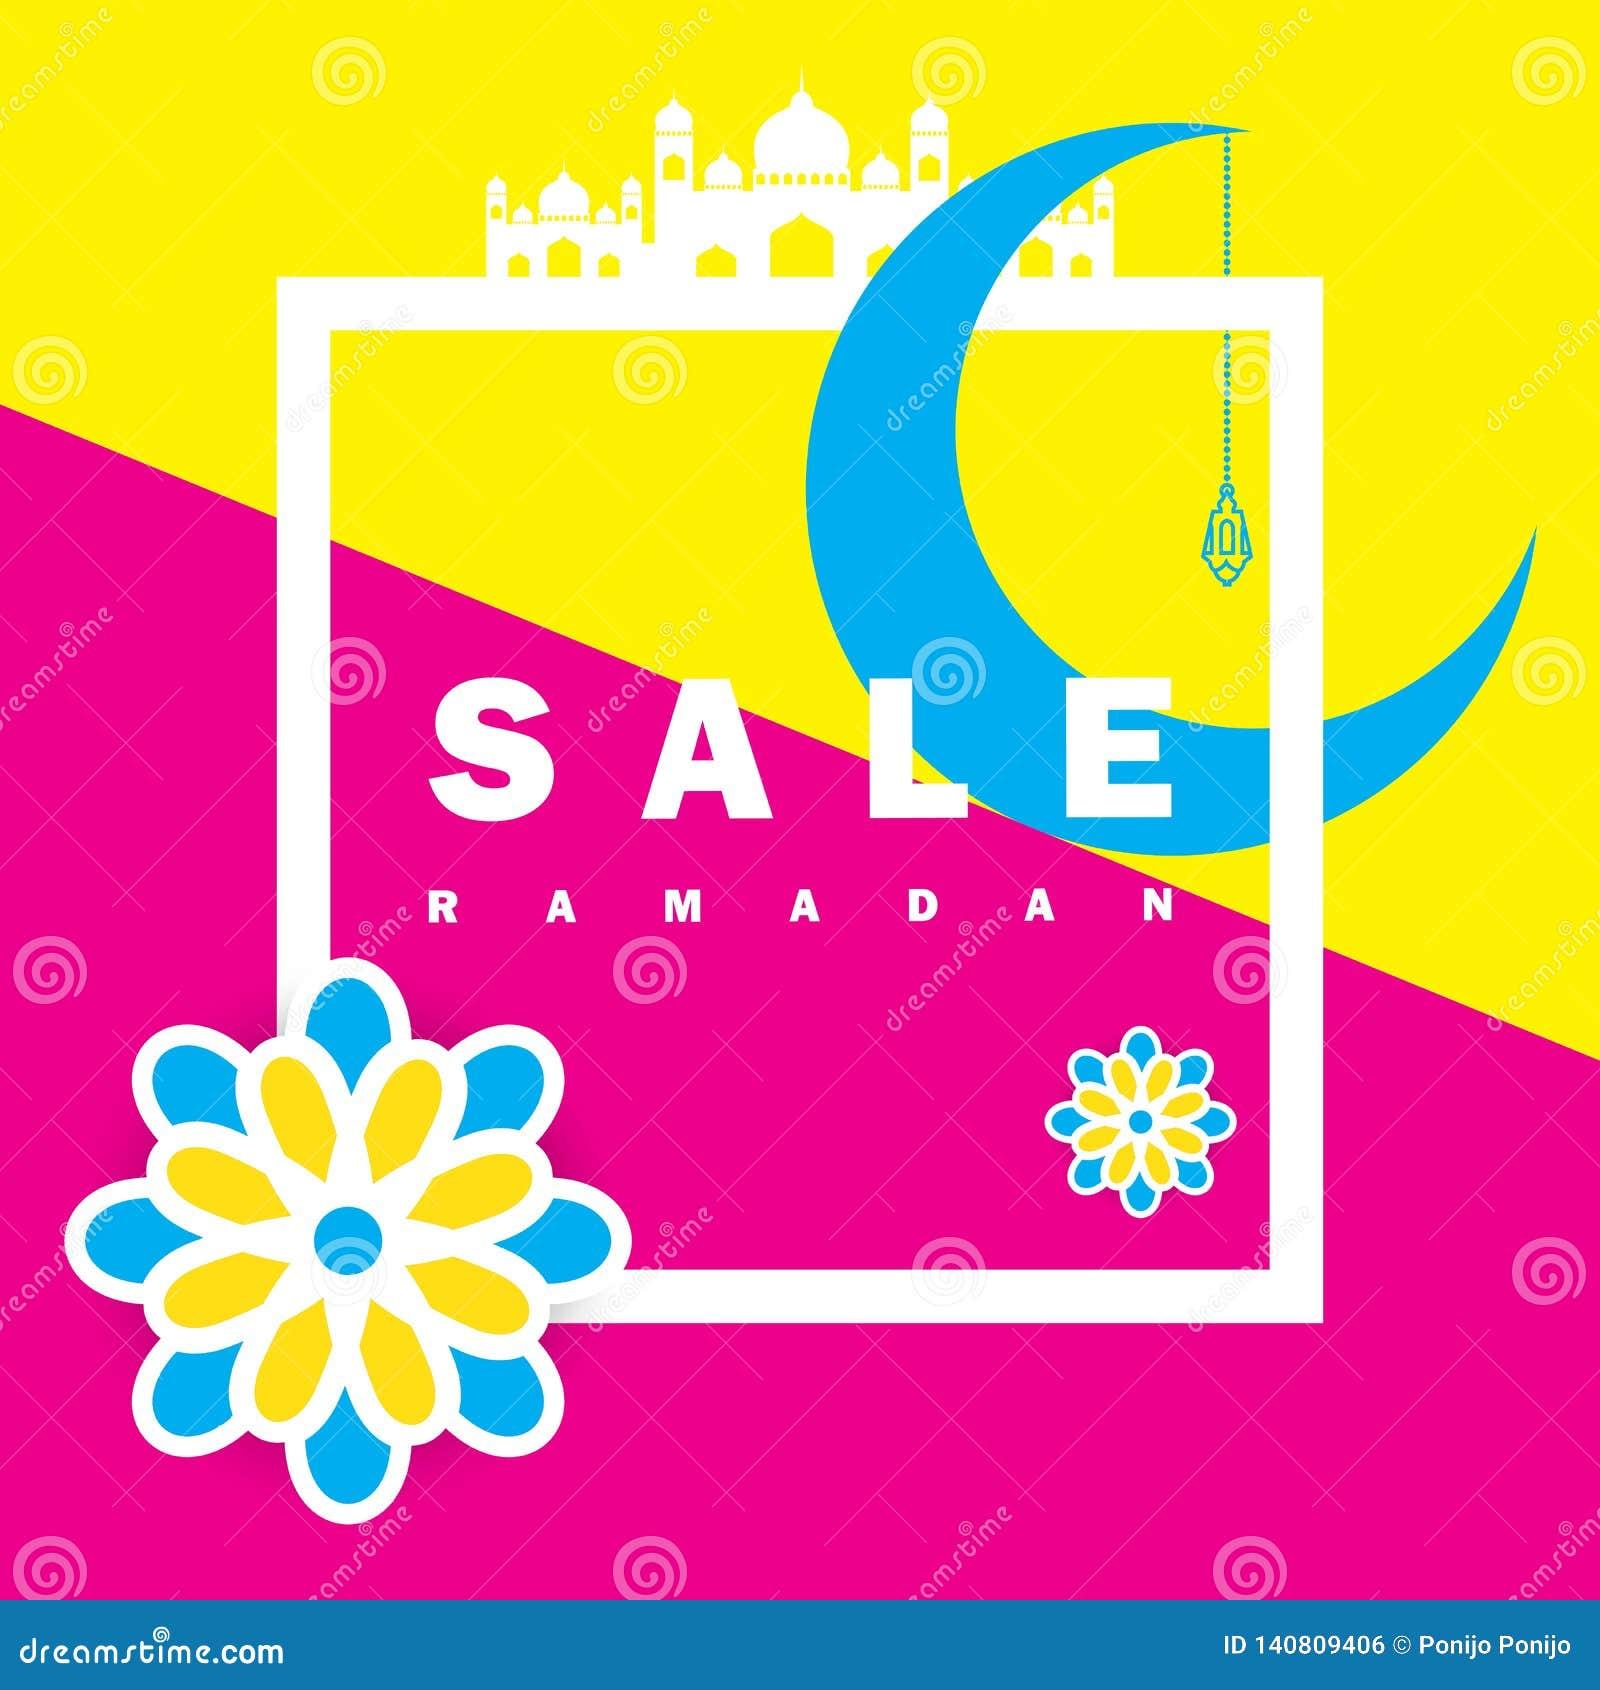 Flyer, Sale, discount, greeting card, label or banner occasion of Ramadan Kareem and Eid Mubarak Celebration